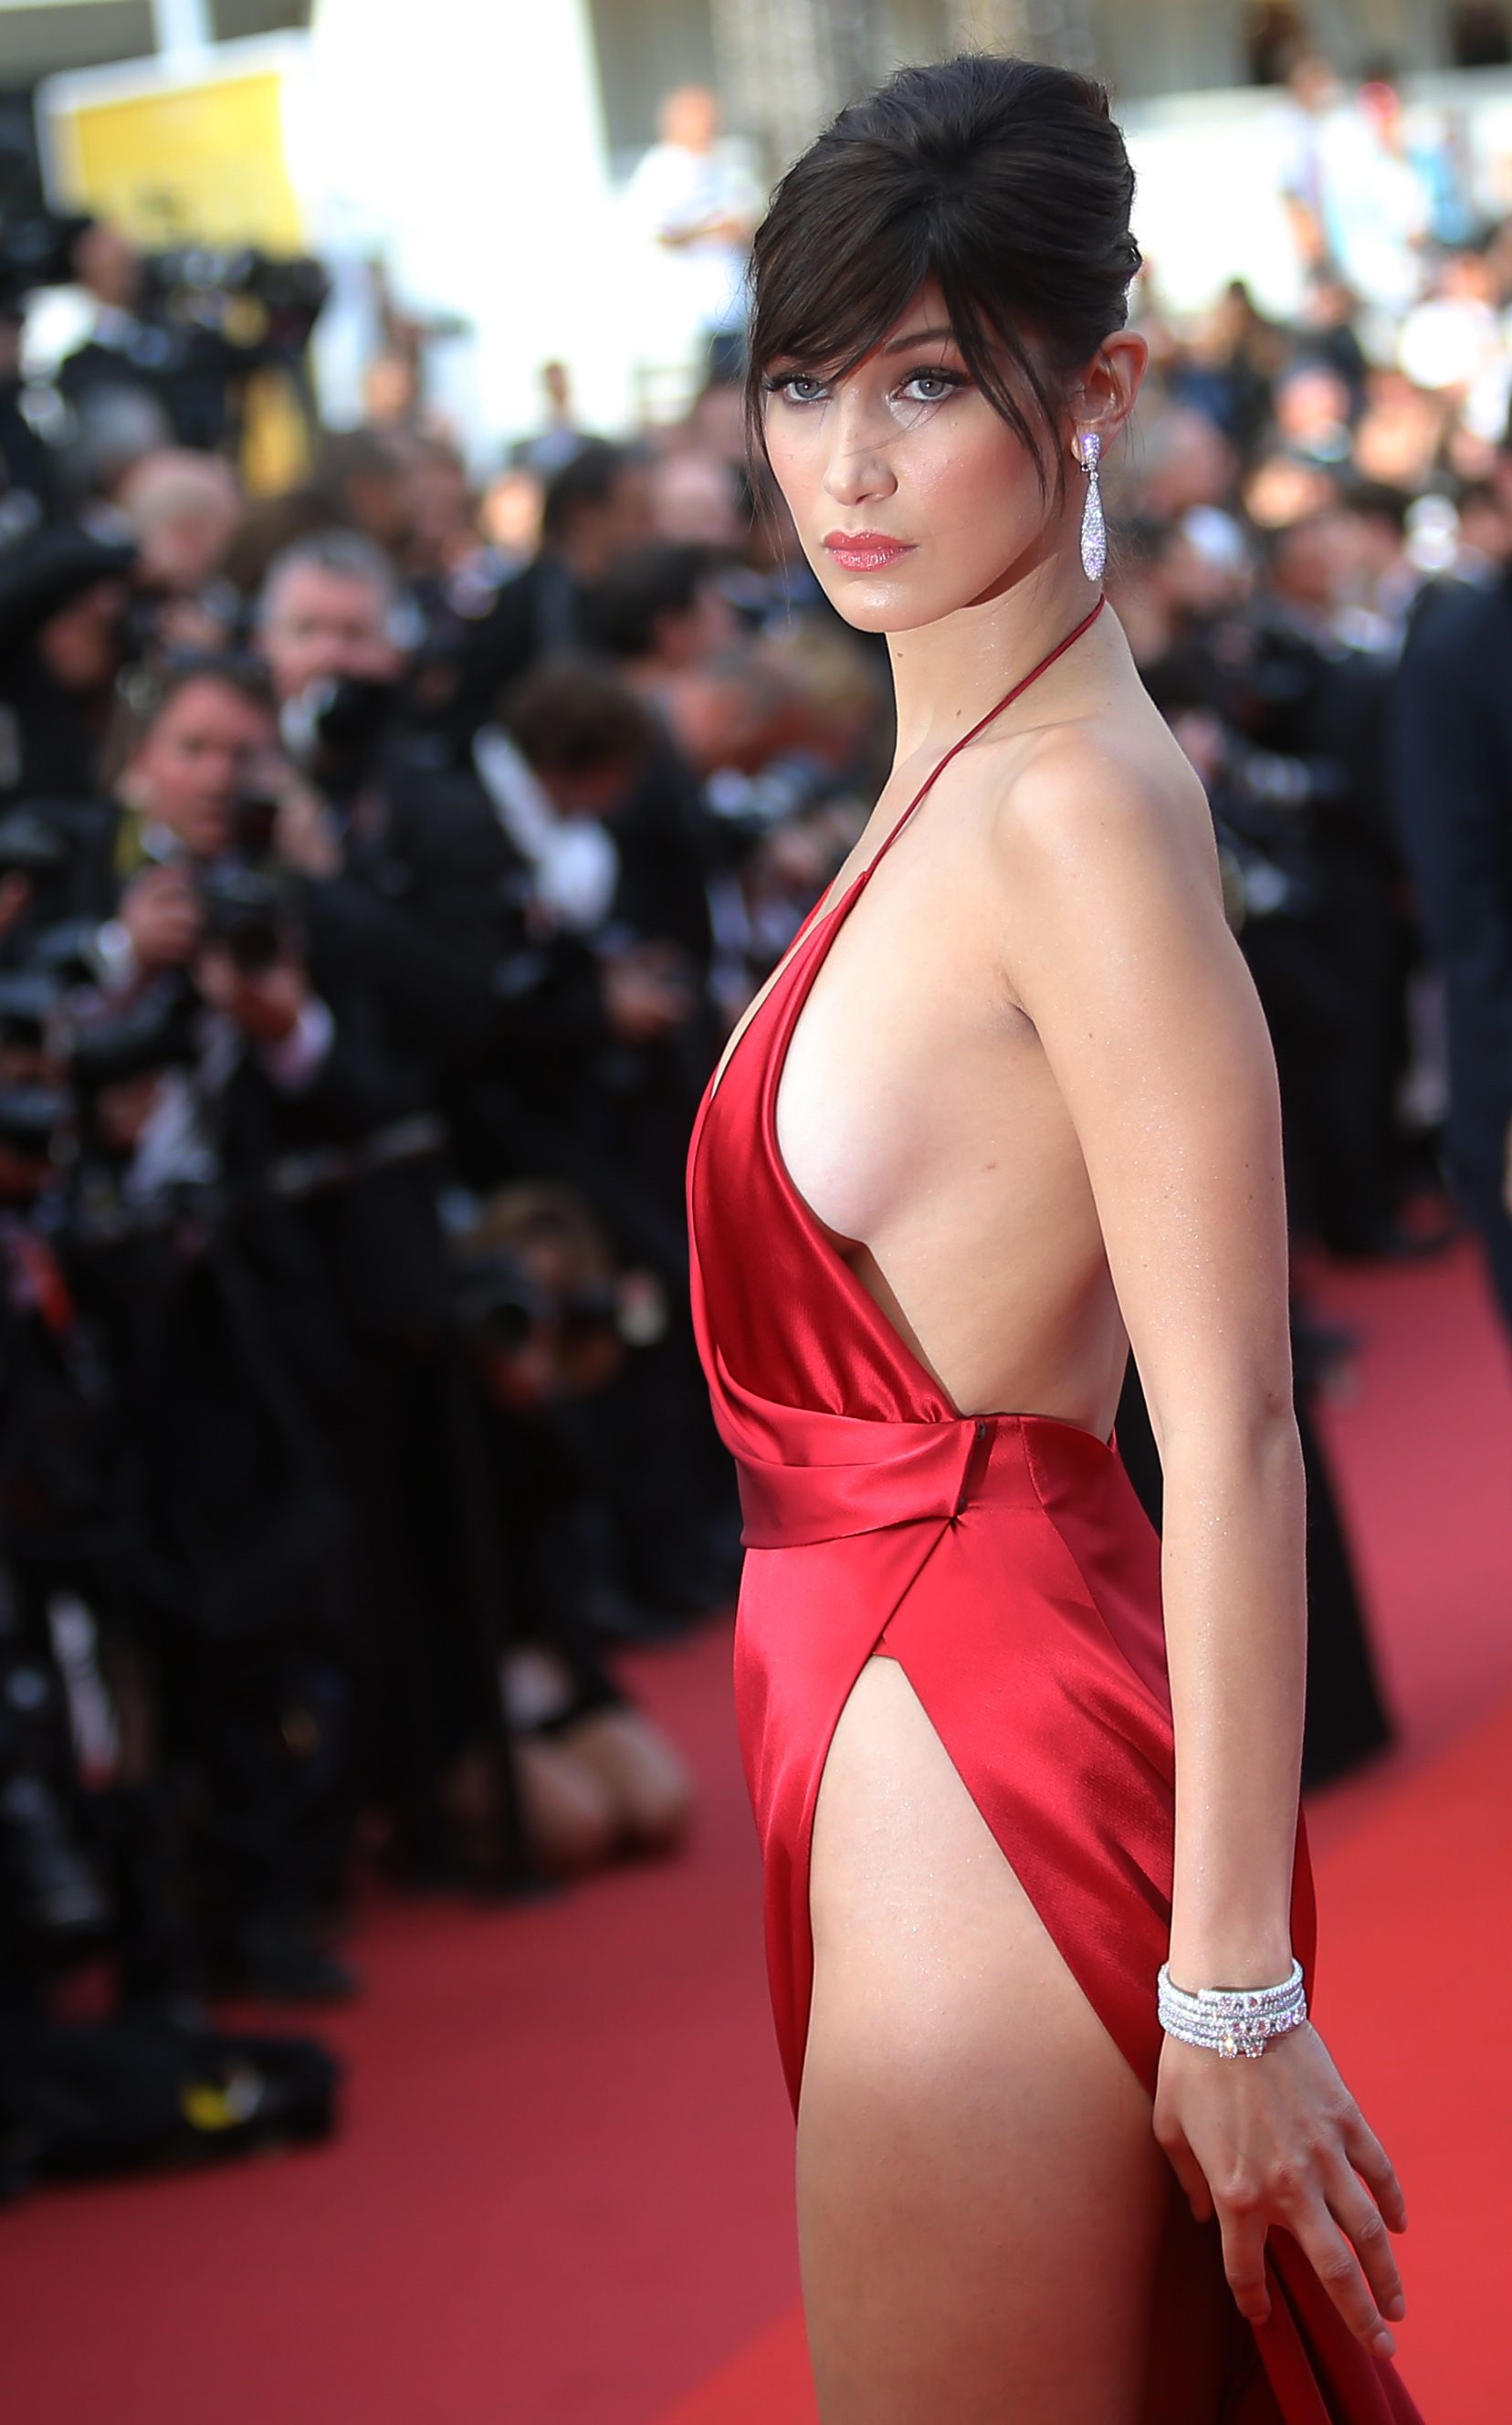 Sideboobs Bella Hadid naked (51 photo), Ass, Leaked, Boobs, lingerie 2019